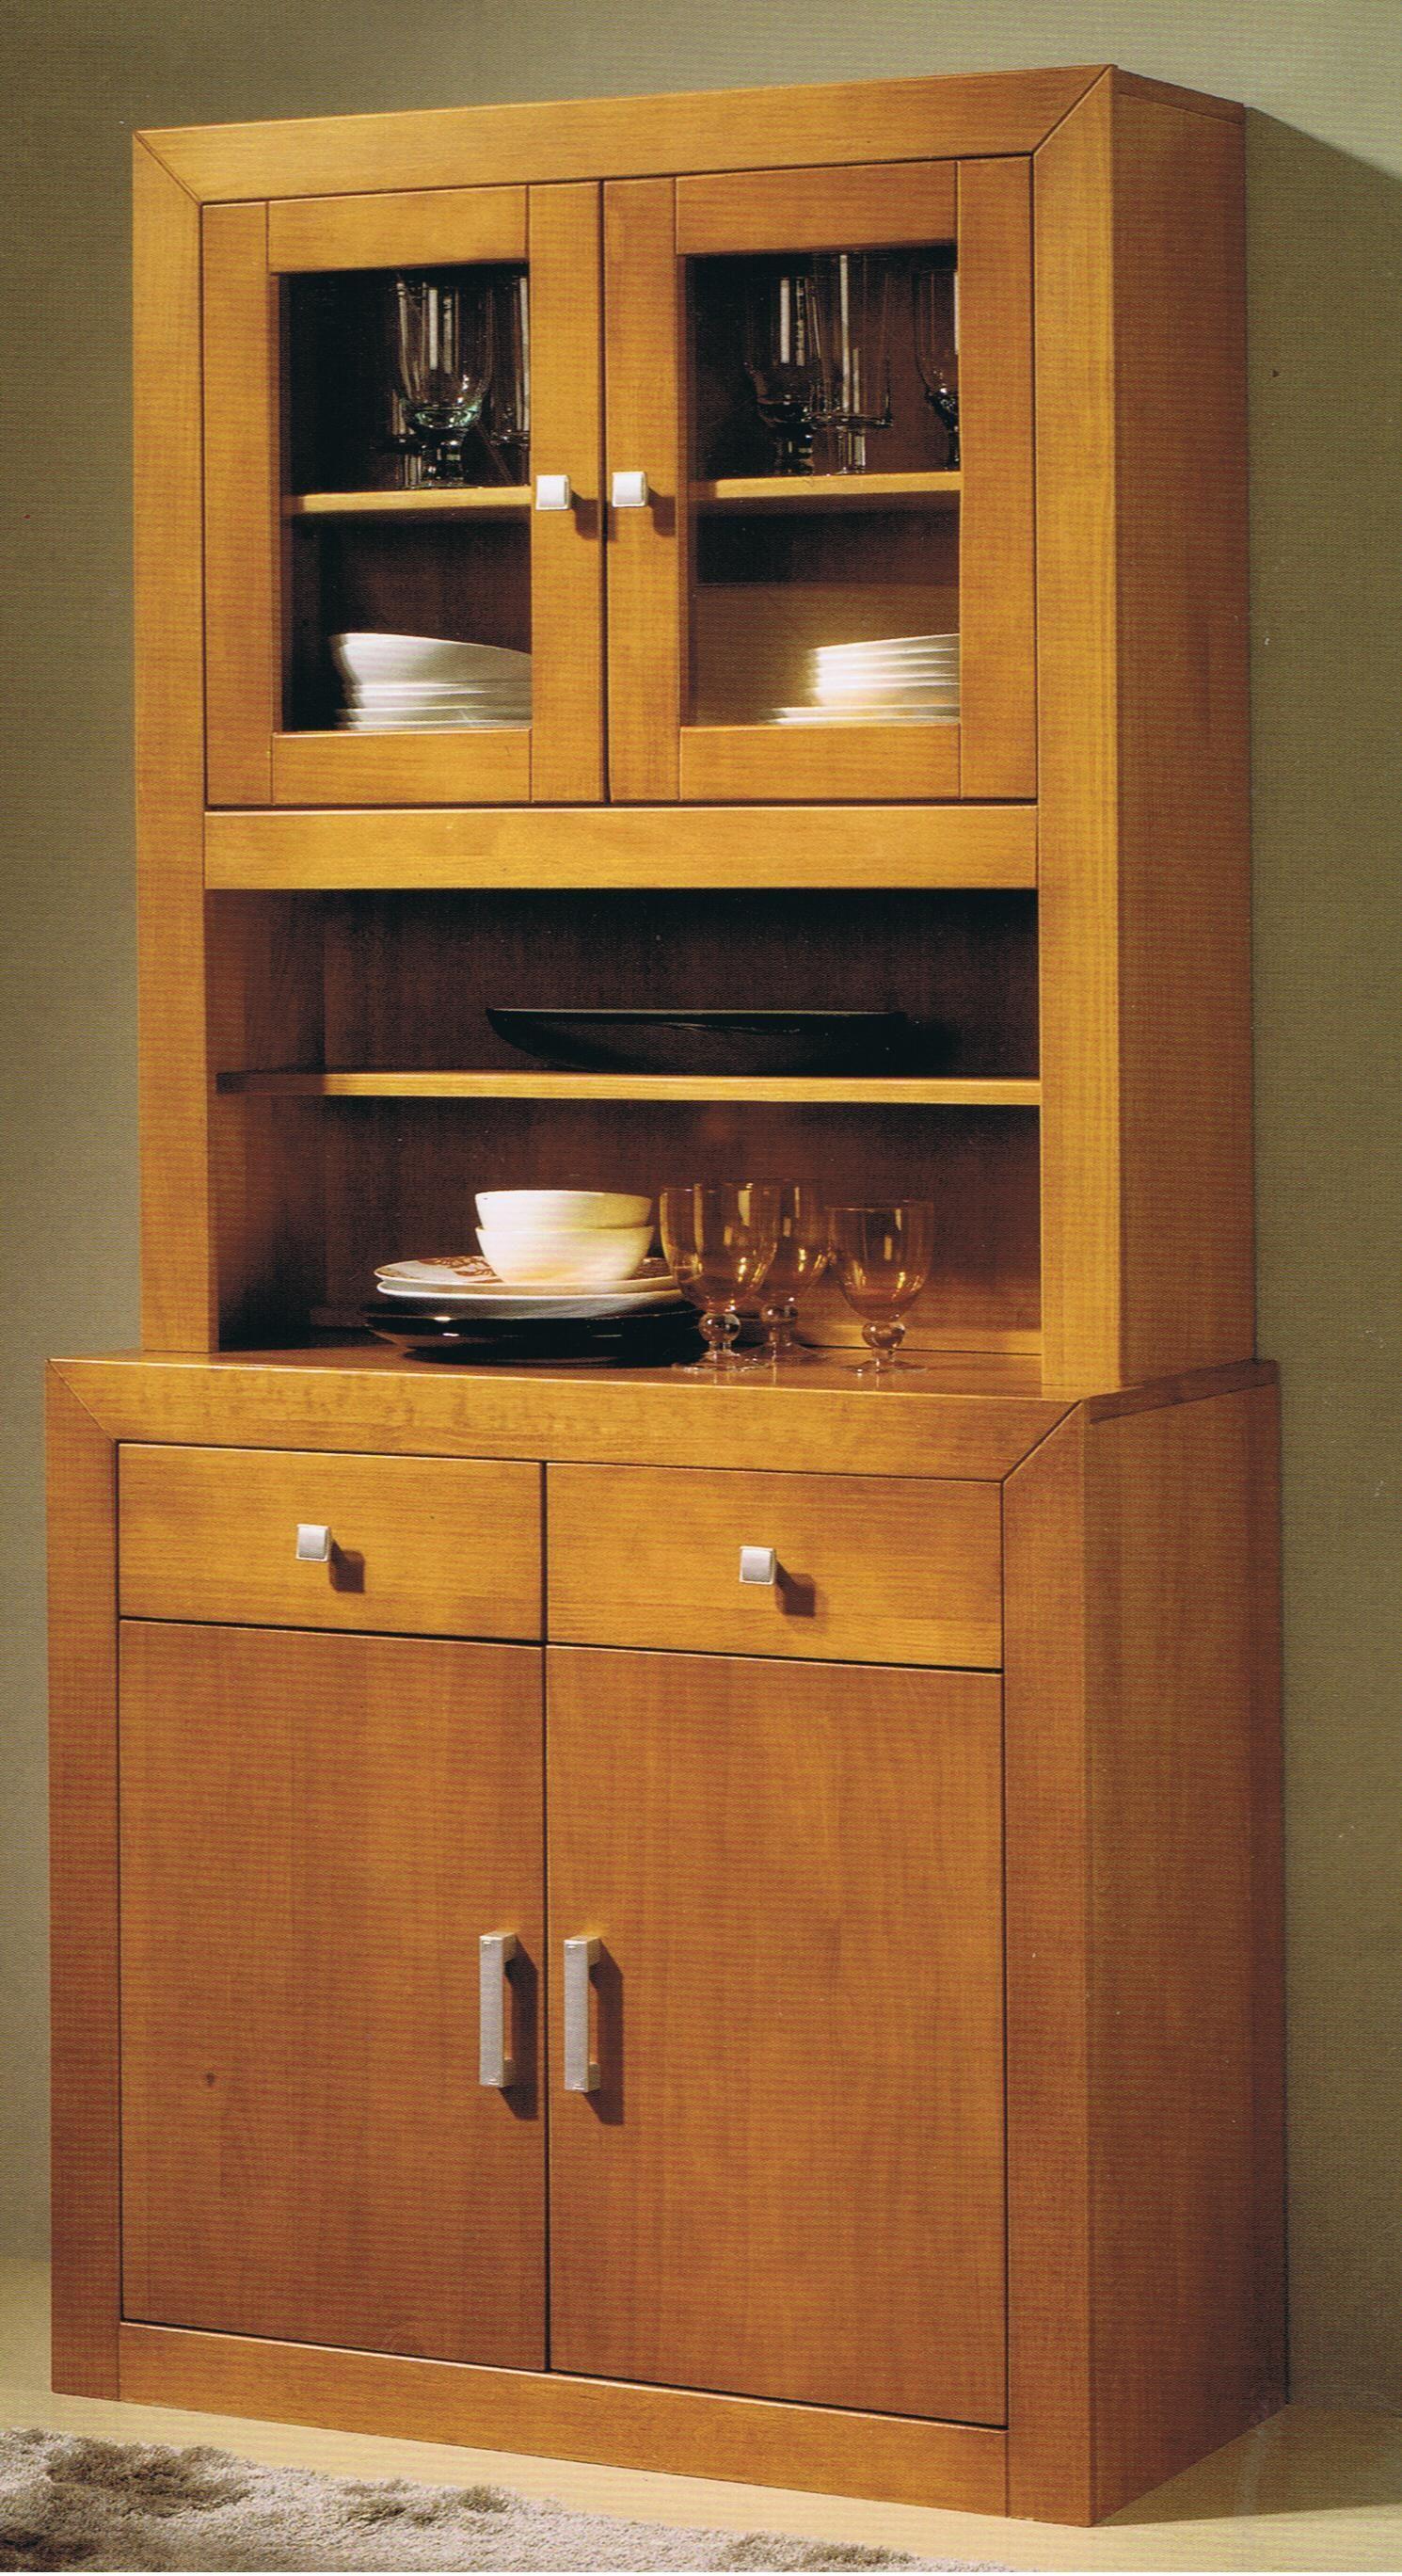 Alacena kynus nova alacena 2 puertas medidas 187x91x42 - Muebles de cocina madera maciza ...